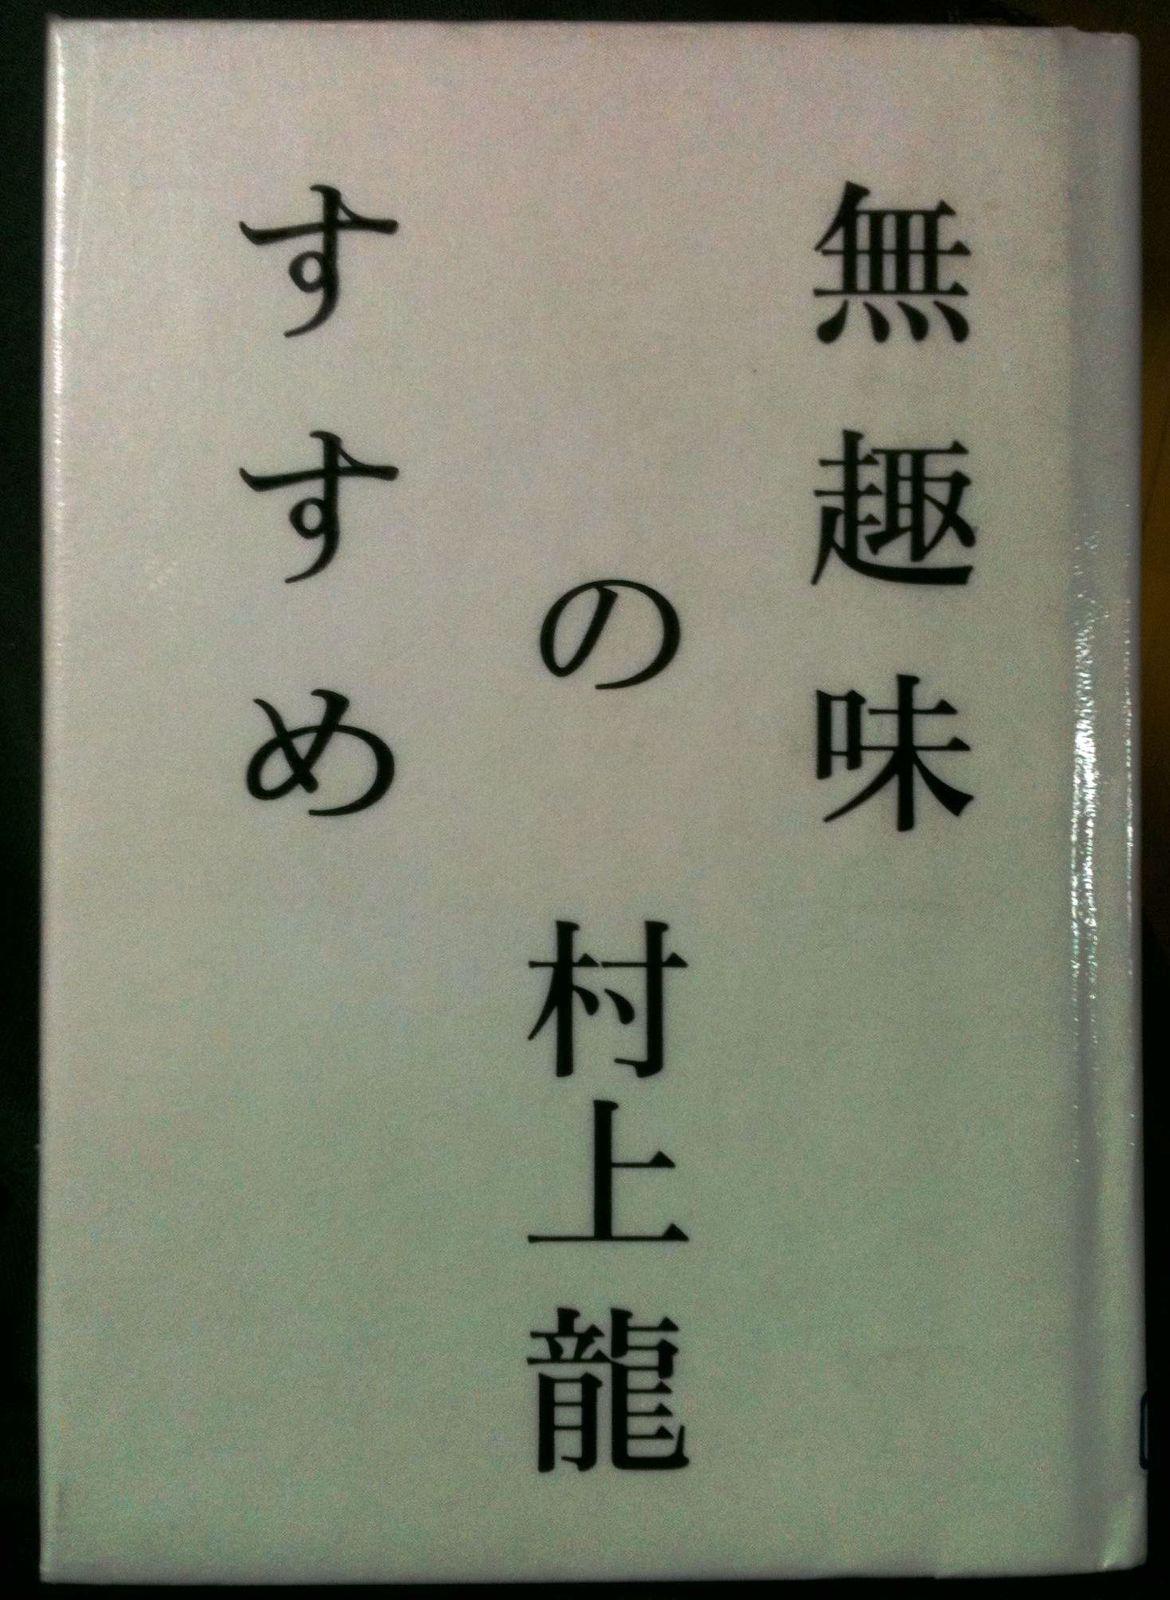 20110528_19_10_29